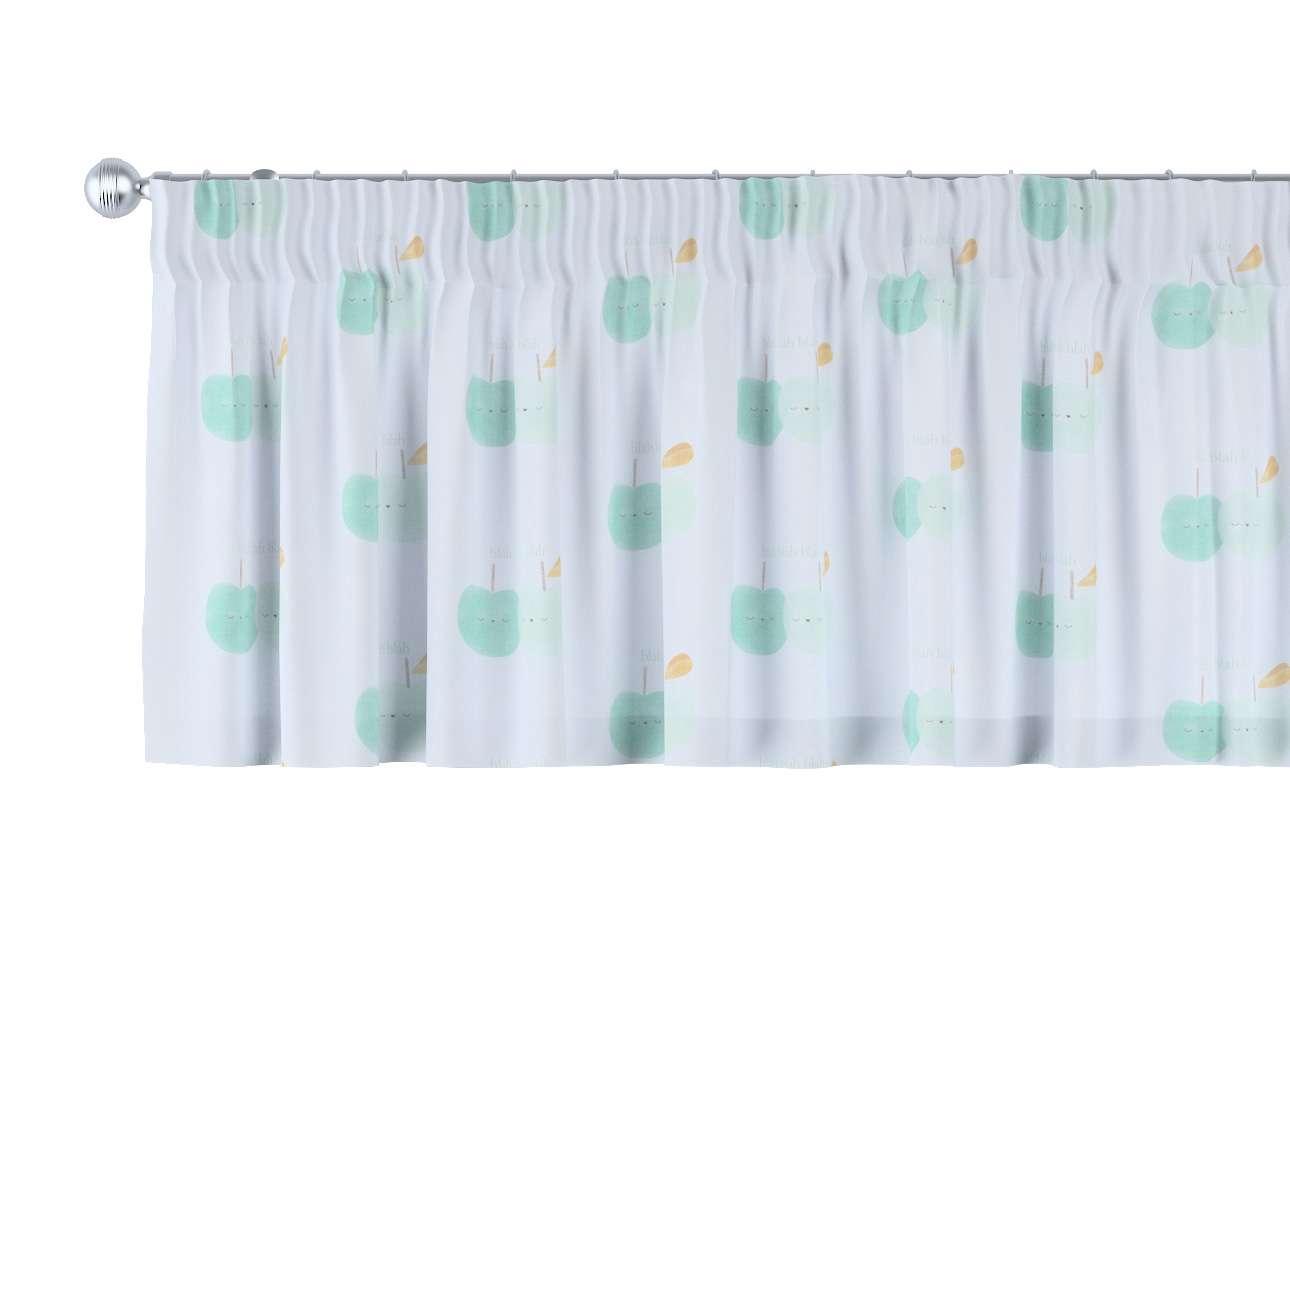 Pencil pleat pelmet 130 × 40 cm (51 × 16 inch) in collection Apanona, fabric: 151-02